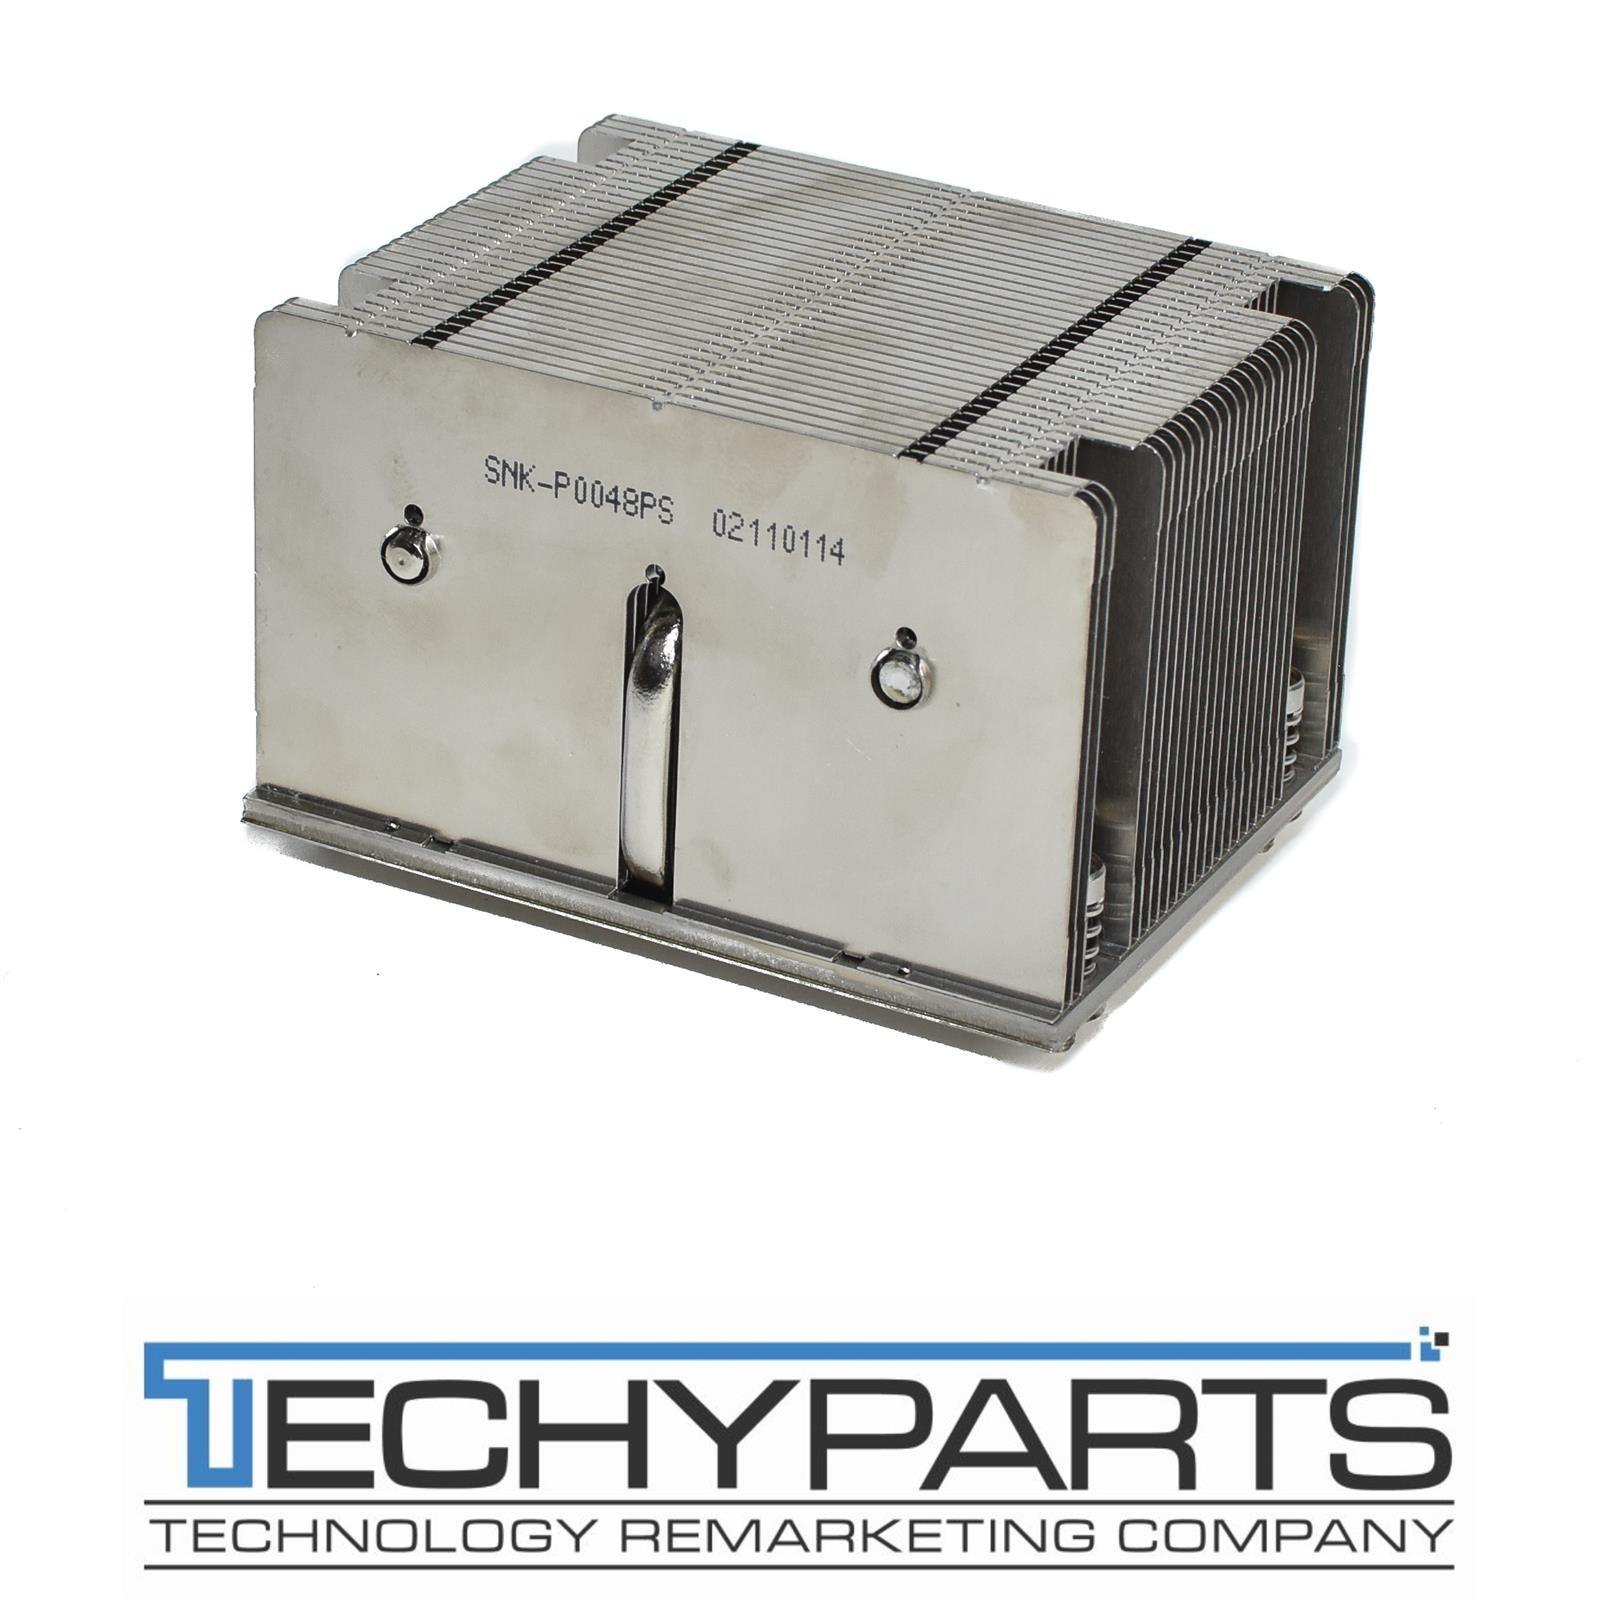 Supermicro SNK-P0048PS 2U Passive Heatsink for Sockets LGA 2011